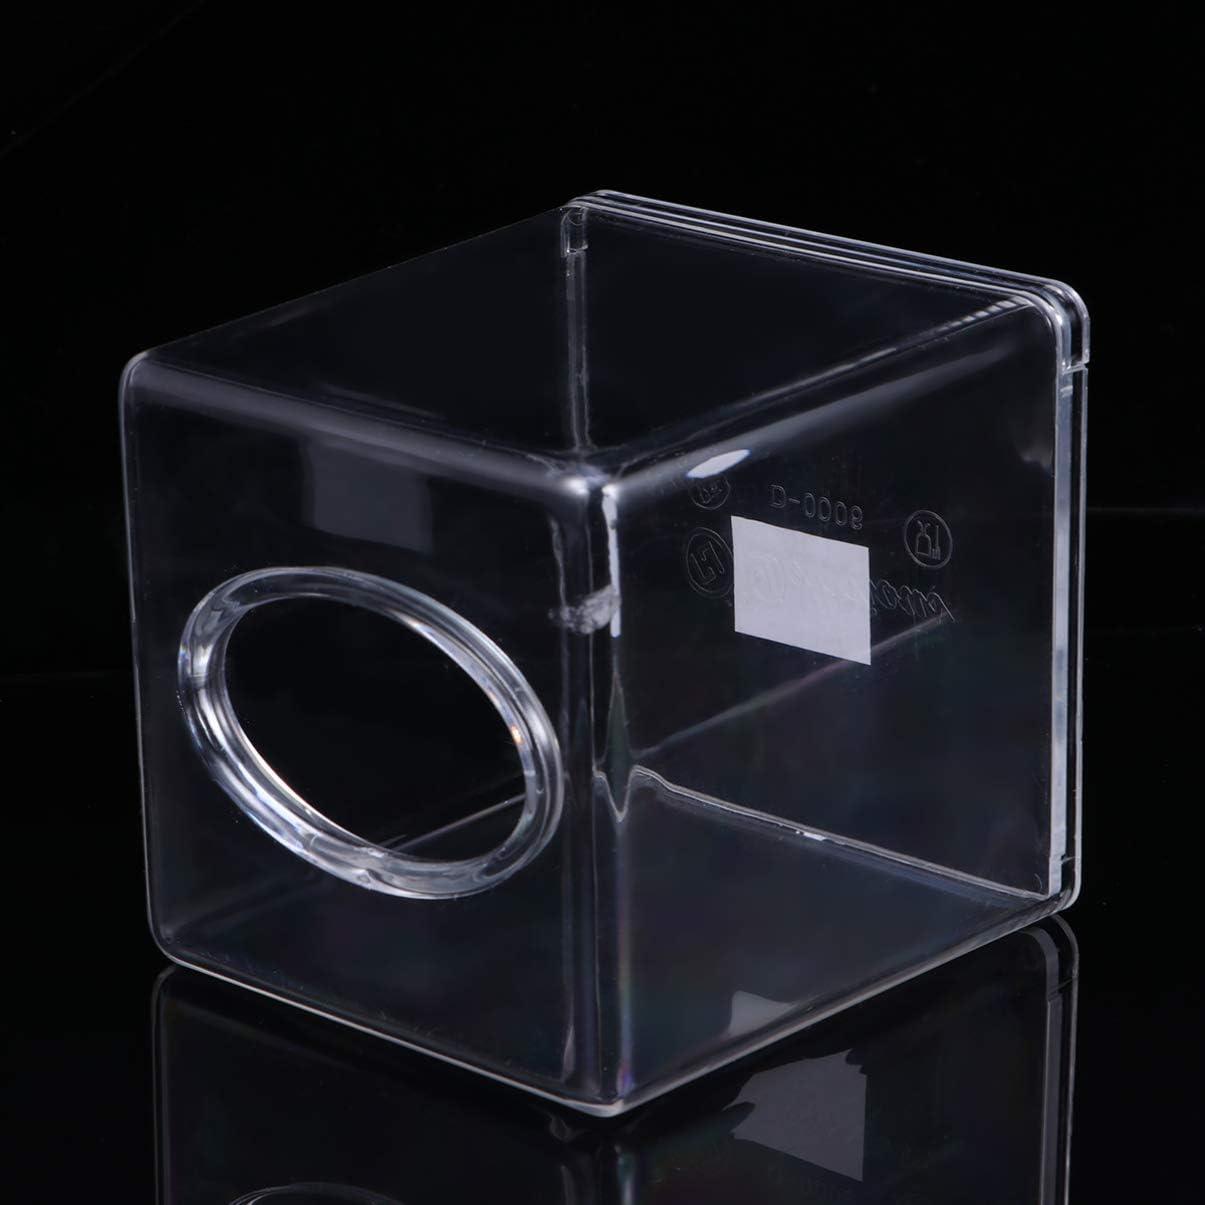 Dispensador de pa/ñuelos faciales transparente para servilletas oficina tocador DOITOOL transparente coche soporte de noche accesorios para encimera